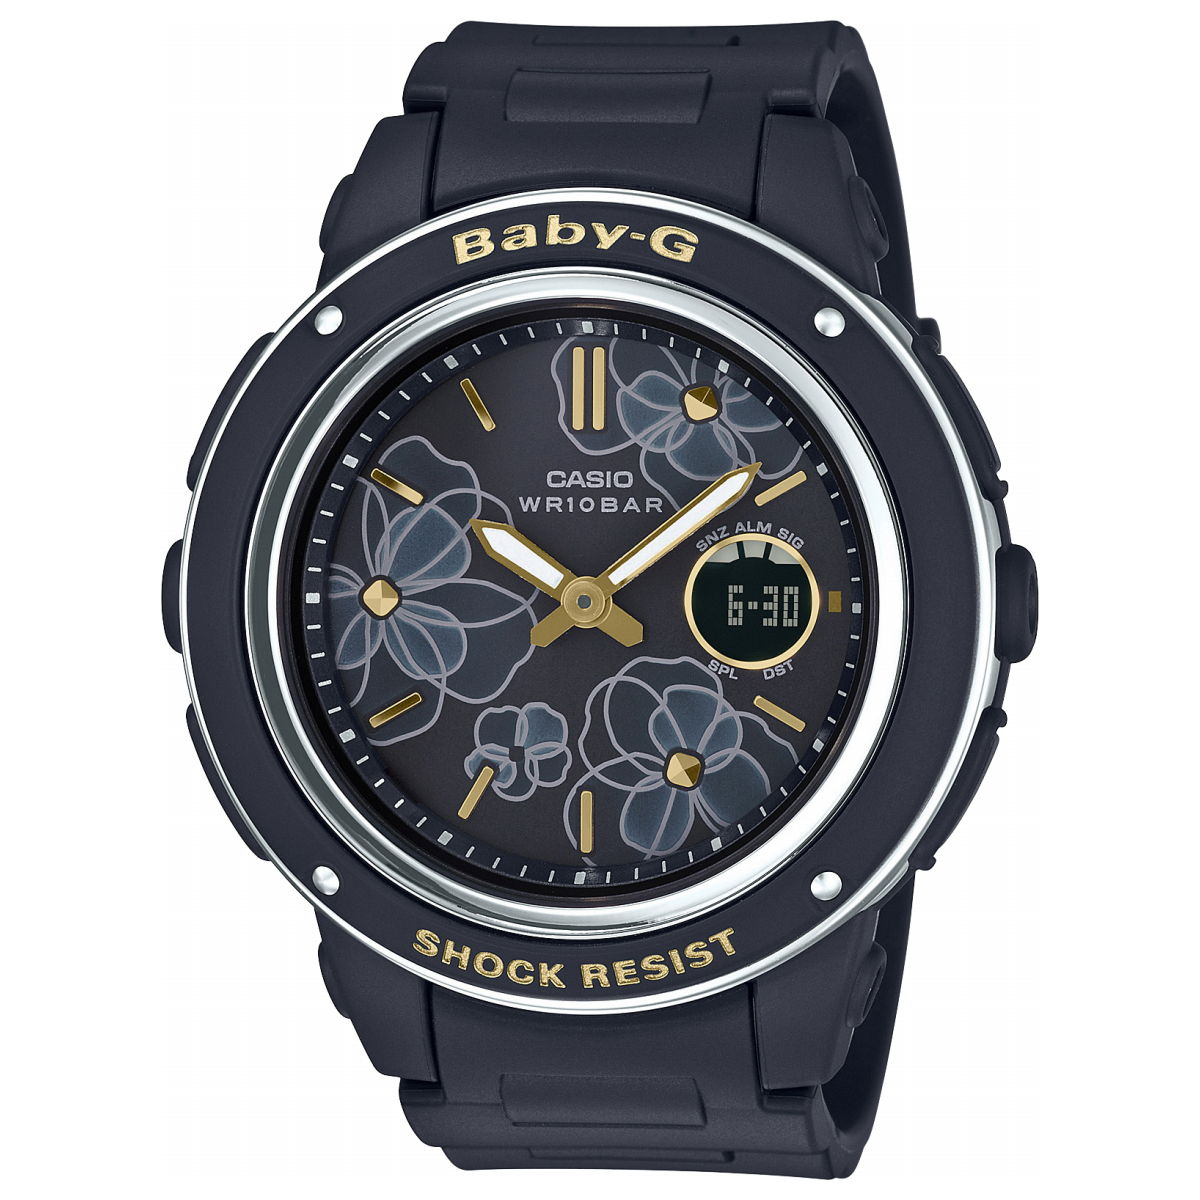 BABY-G カシオ ベビーG レディース 腕時計 フローラル ダイアル 花柄 BGA-150FL-1AJF